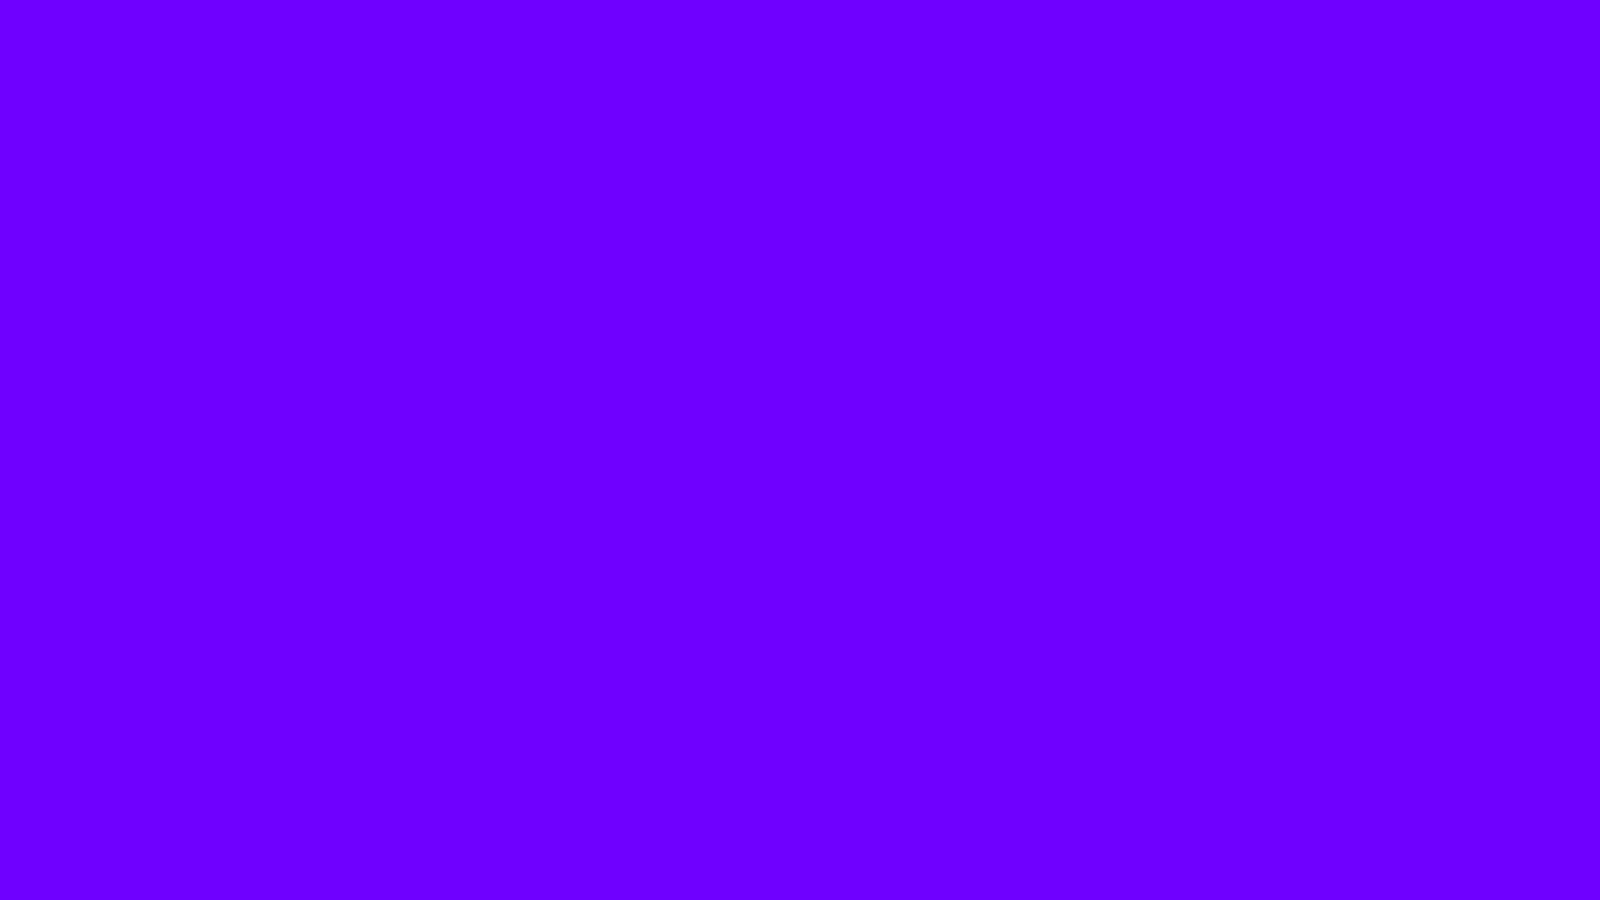 1600x900 Electric Indigo Solid Color Background